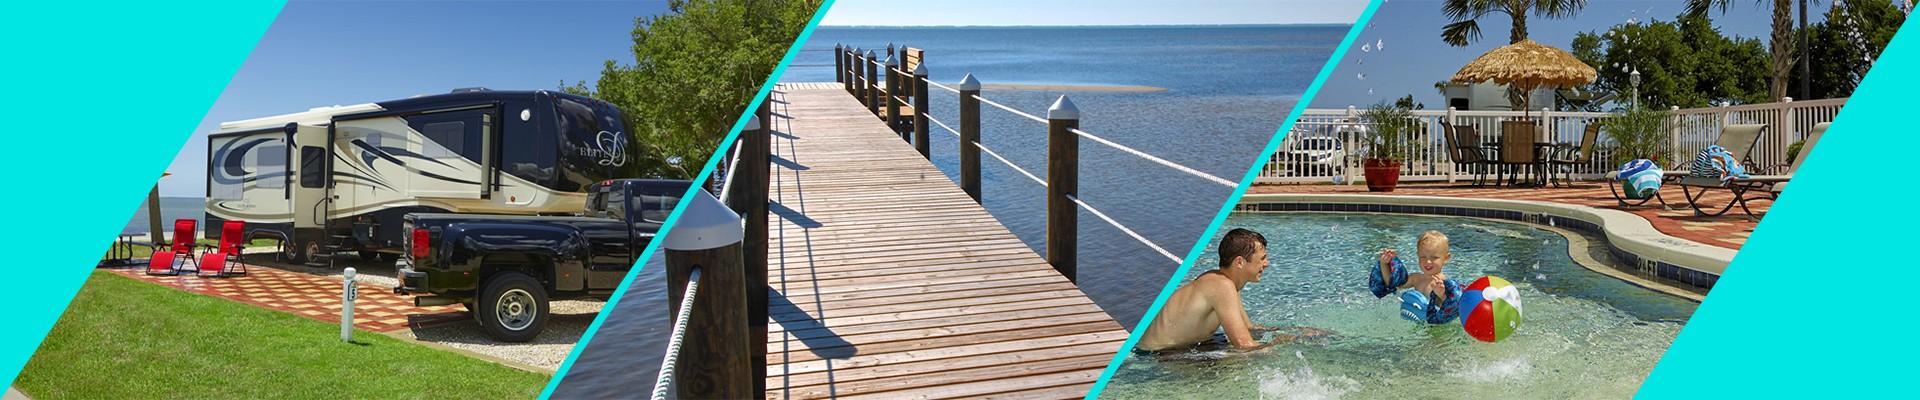 Coastline RV Resort in Eastpoint, Florida